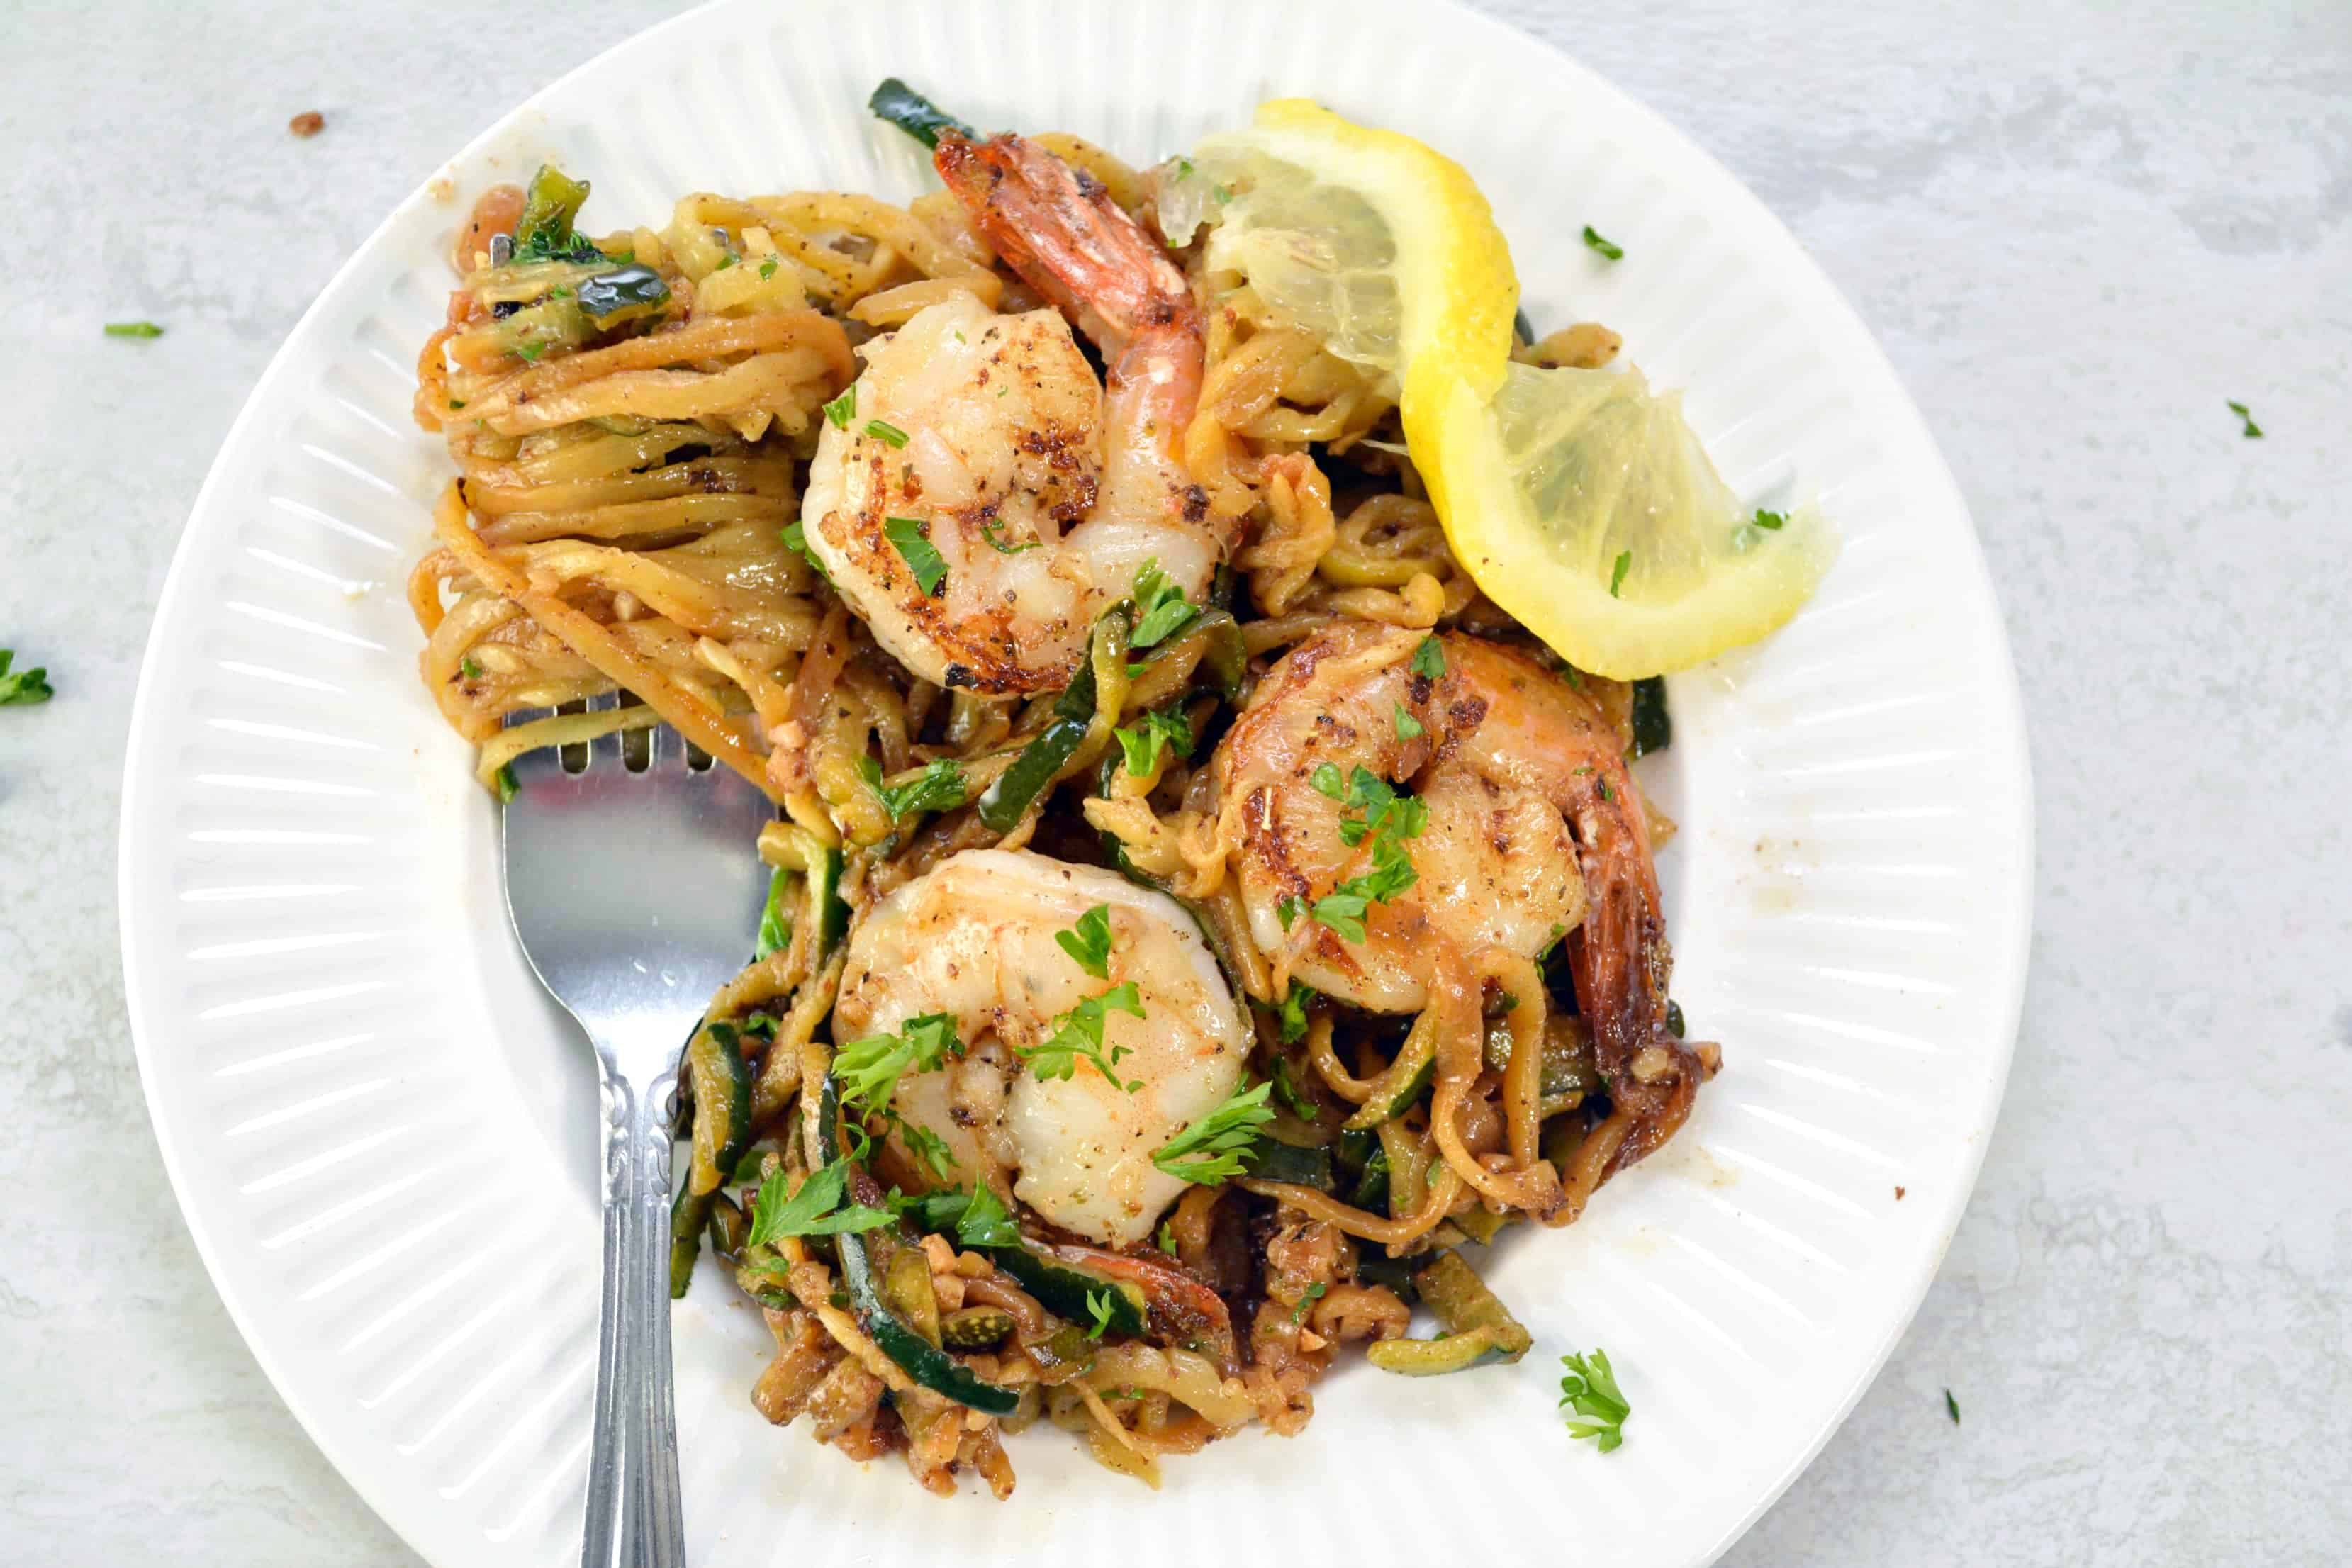 Lemon Garlic Butter Shrimp with Zoodles